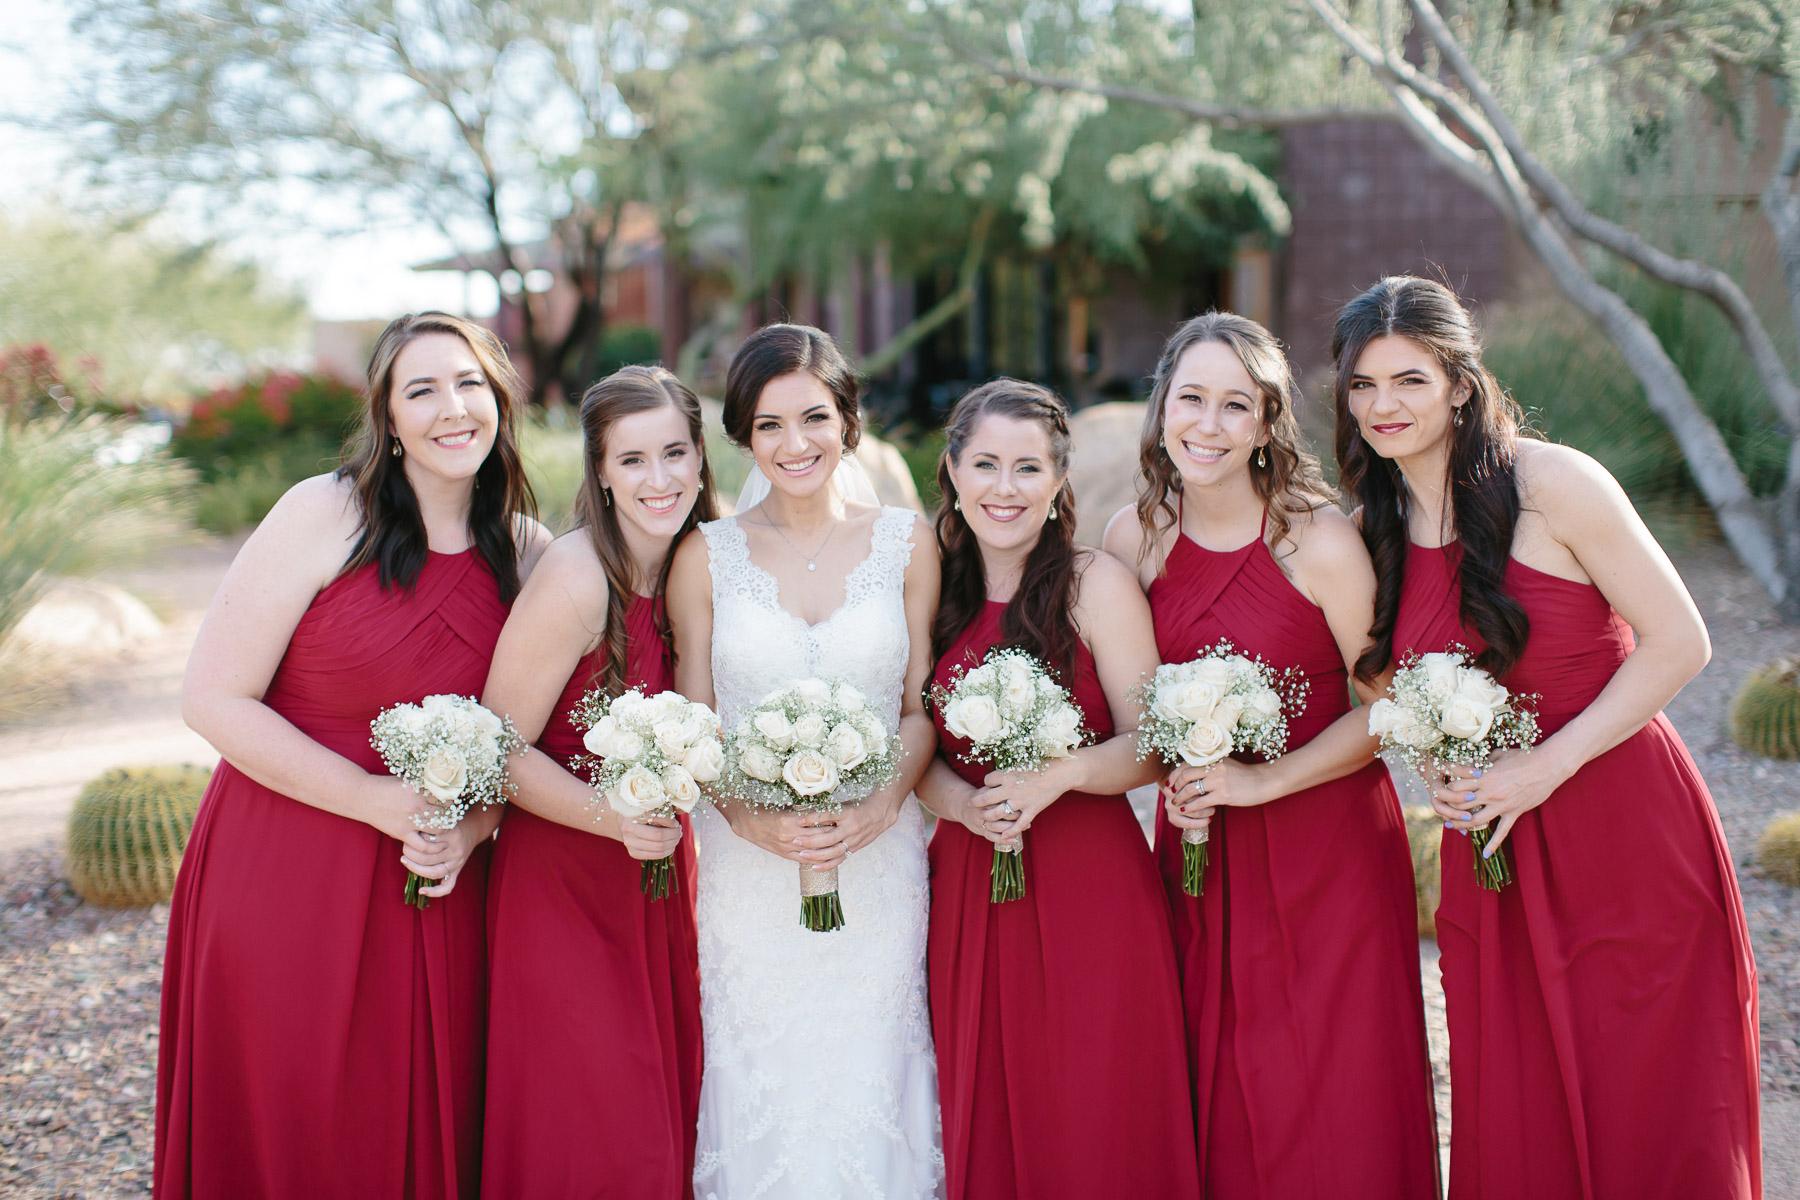 161210-Luxium-Weddings-Arizona-Matt-Jenny-Anthem-Golf-Country-Club-1013.jpg